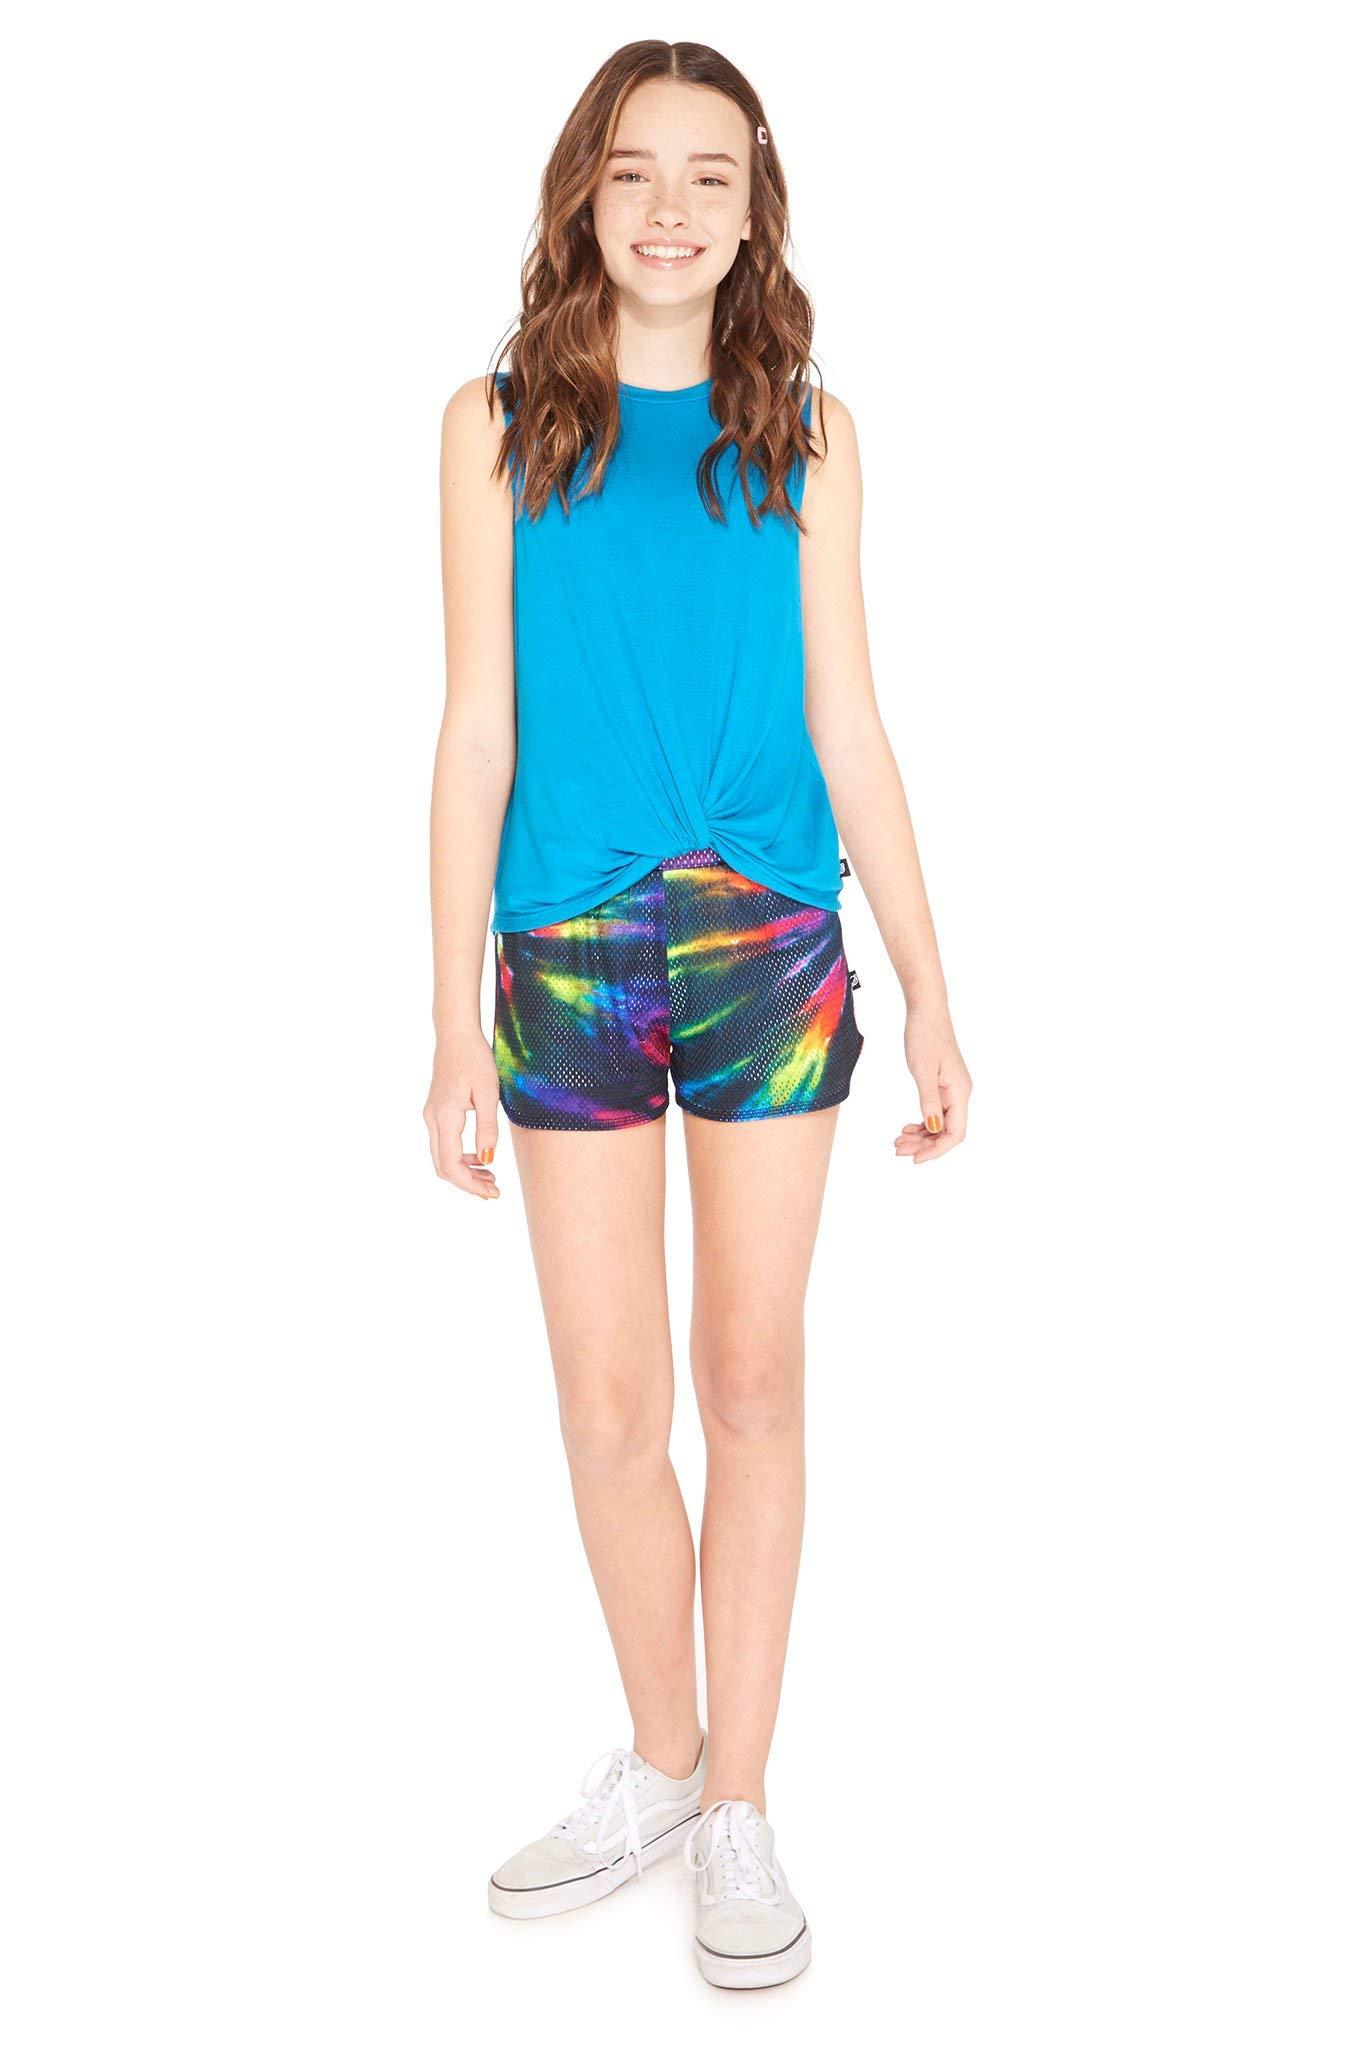 Terez Girls Classic Mesh Shorts (Tie Dye, 4 - Small) by Terez (Image #1)